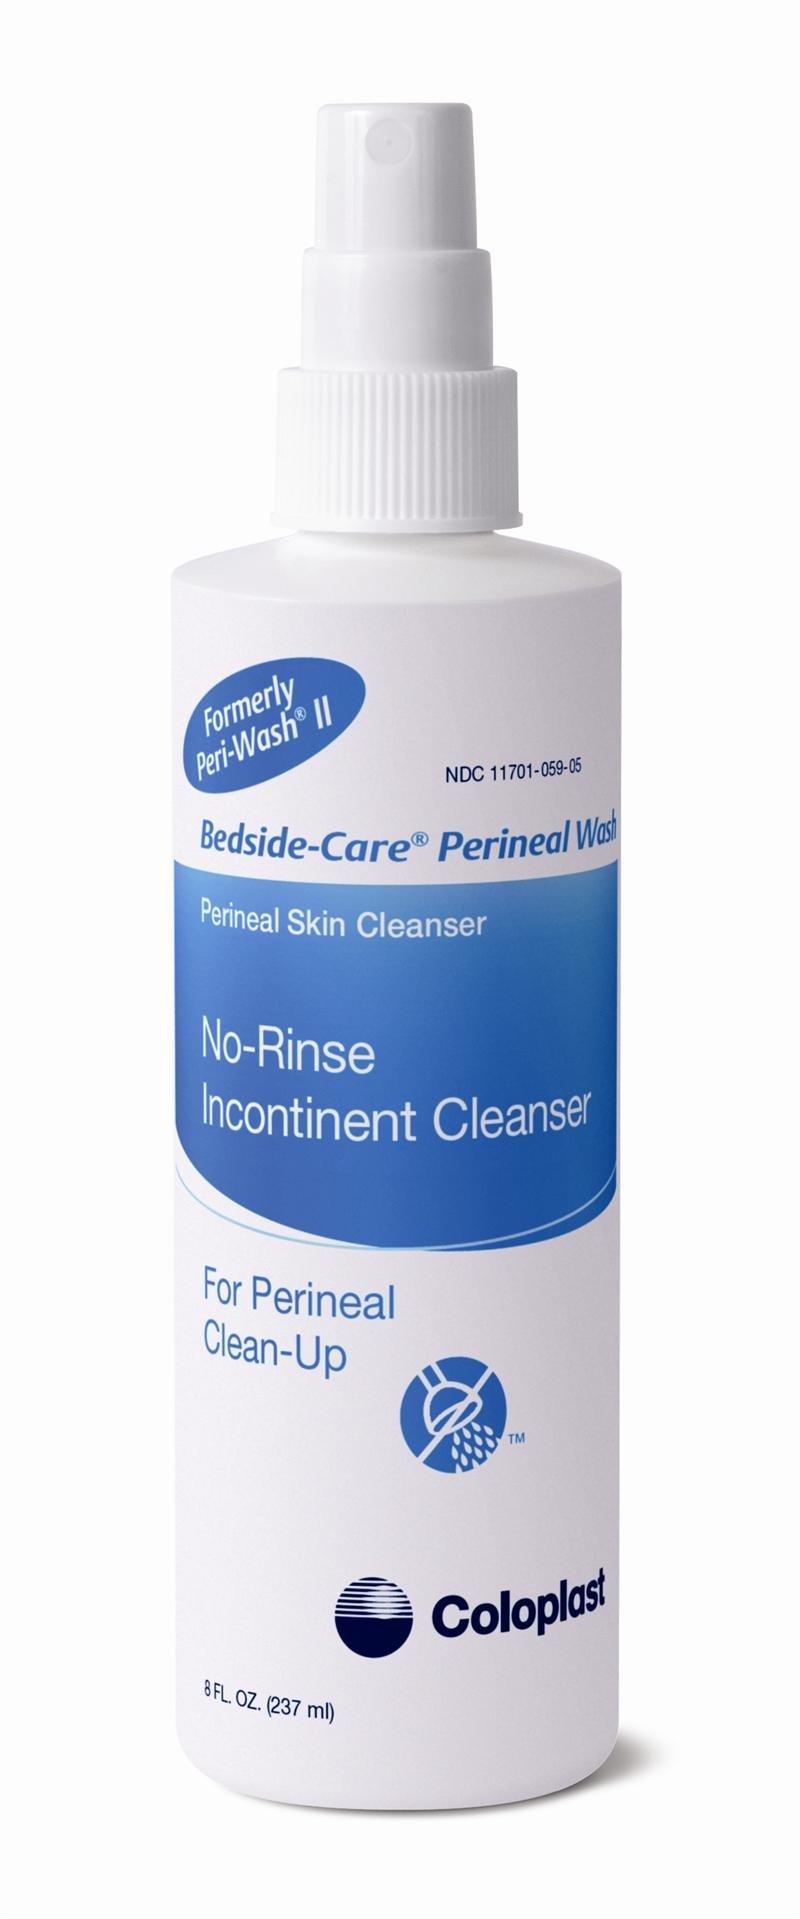 Coloplast Peri Wash Ii Sween Medicated Antiseptic Peri Cleanser Deodorizer - Model 1453